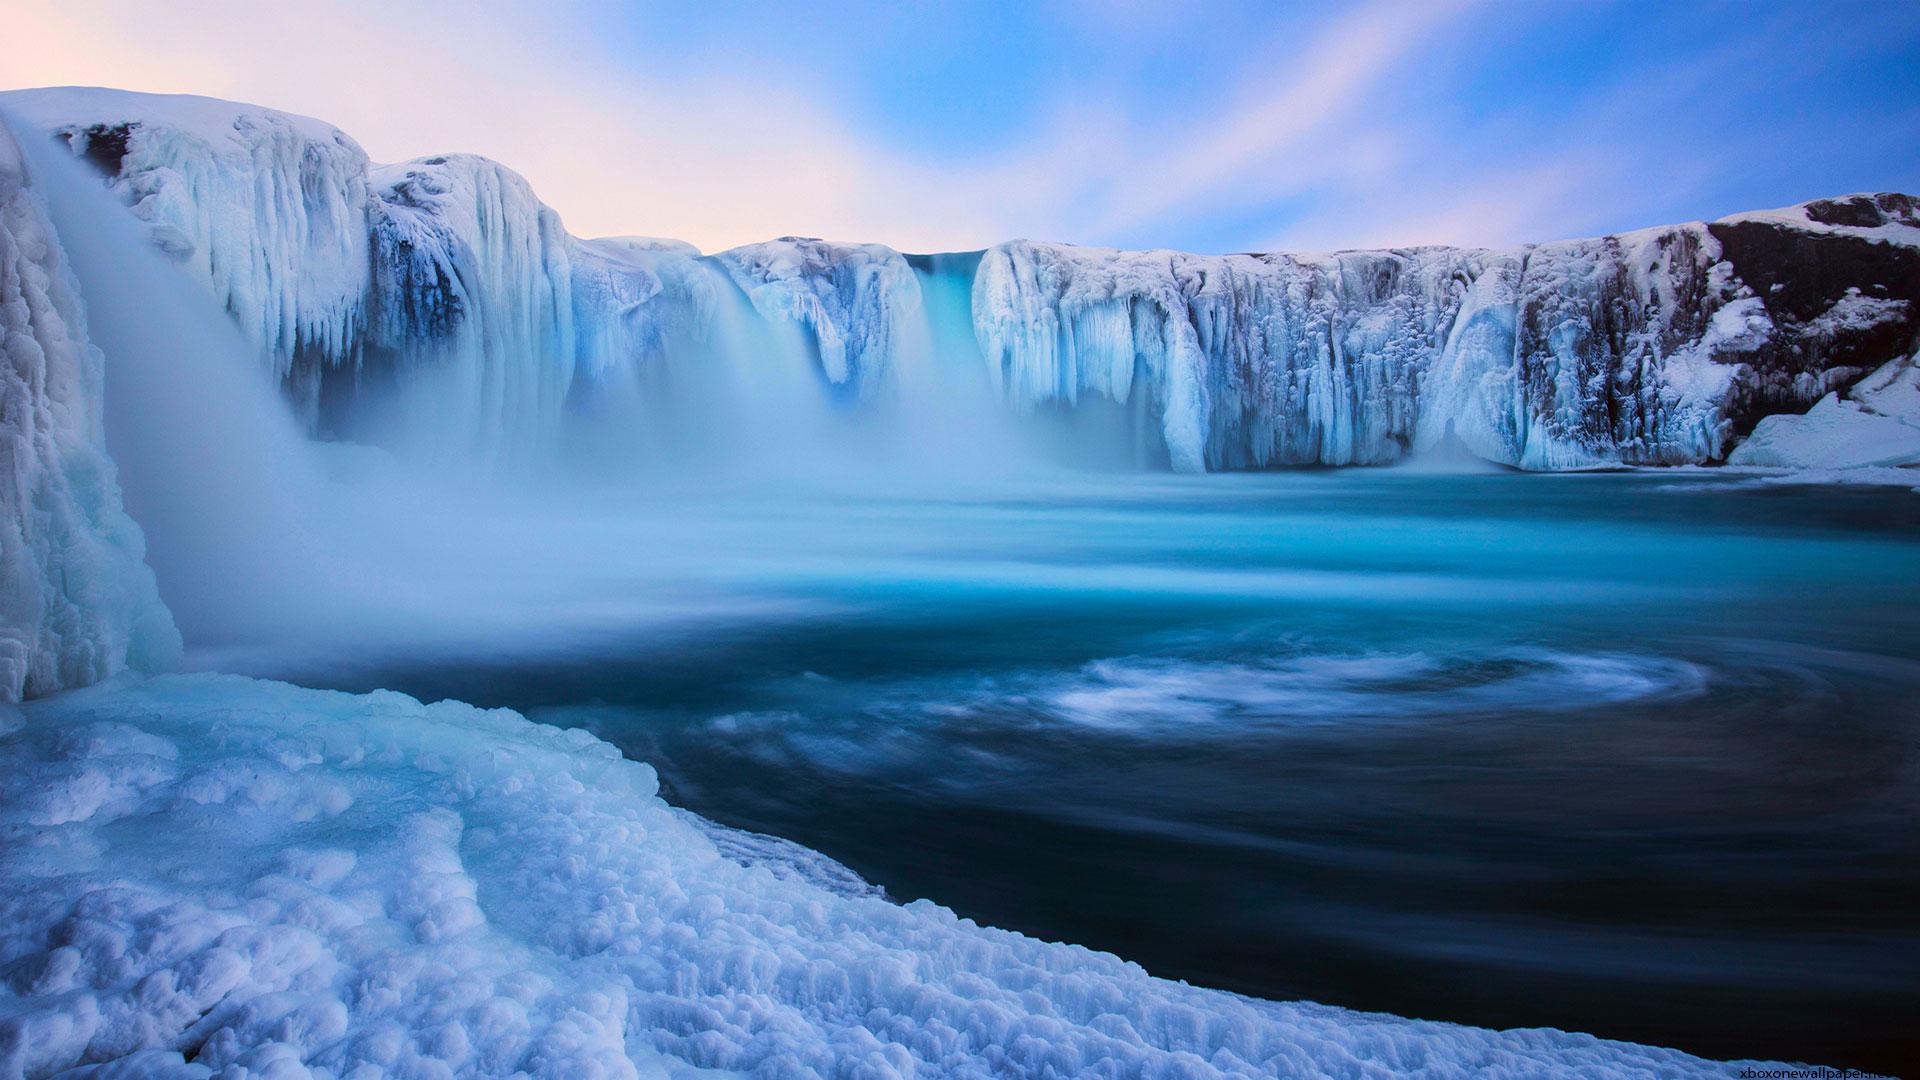 Waterfall Wallpaper HD Wallpaper Photo 1080p 1920x1080